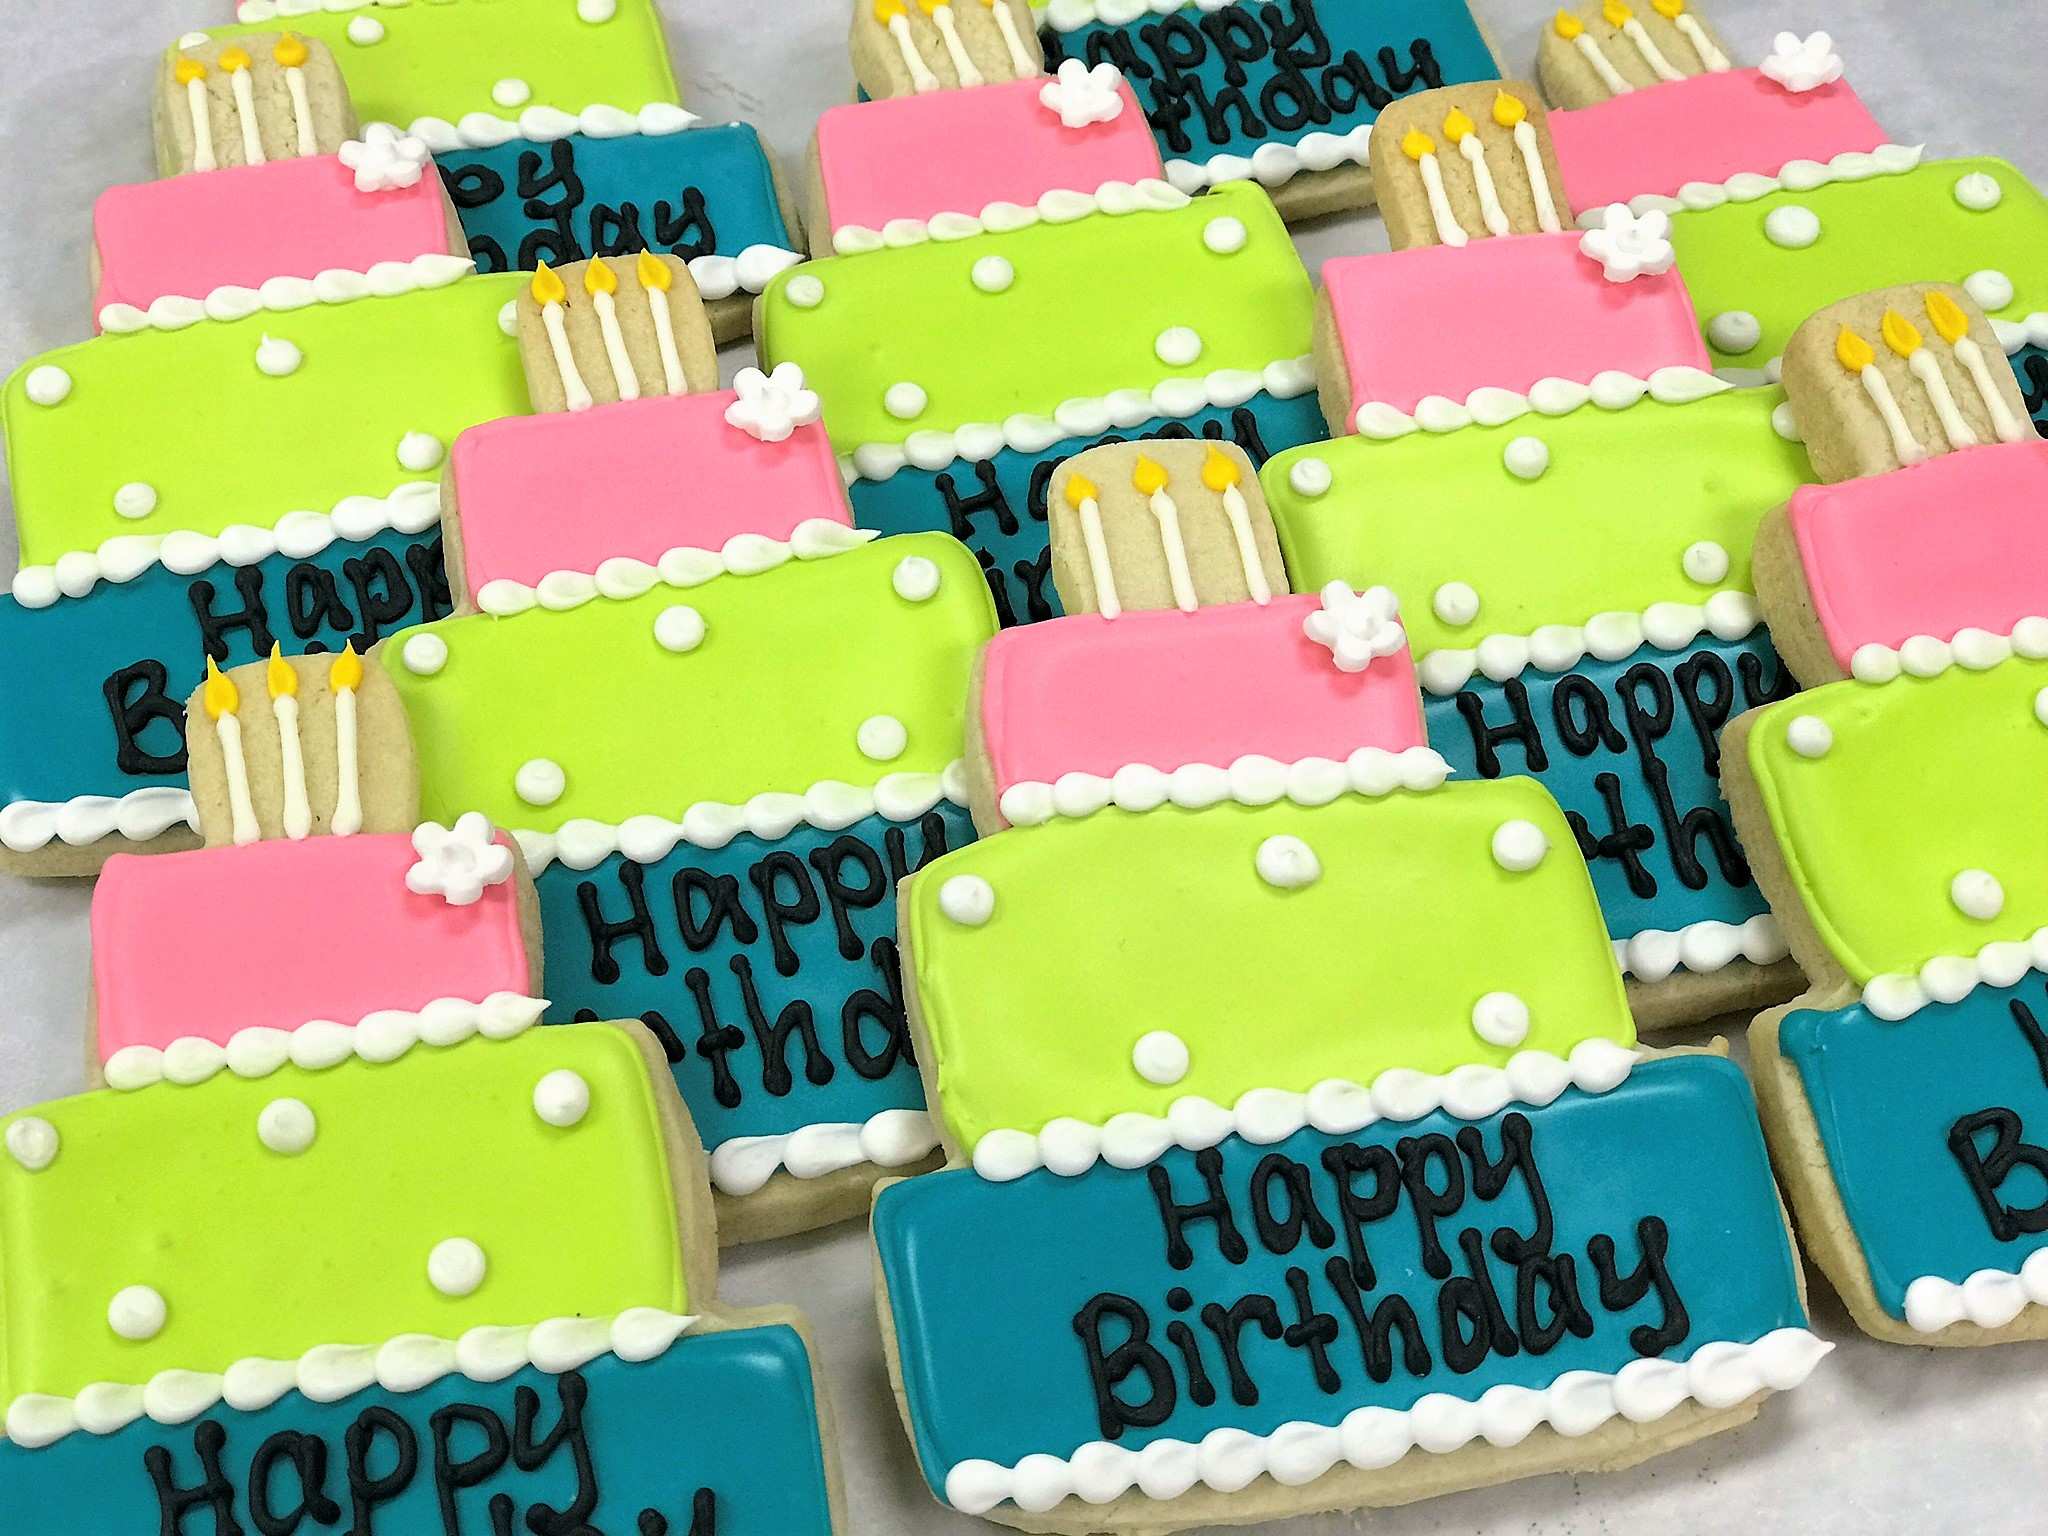 birthday cake sugar cookies.jpeg